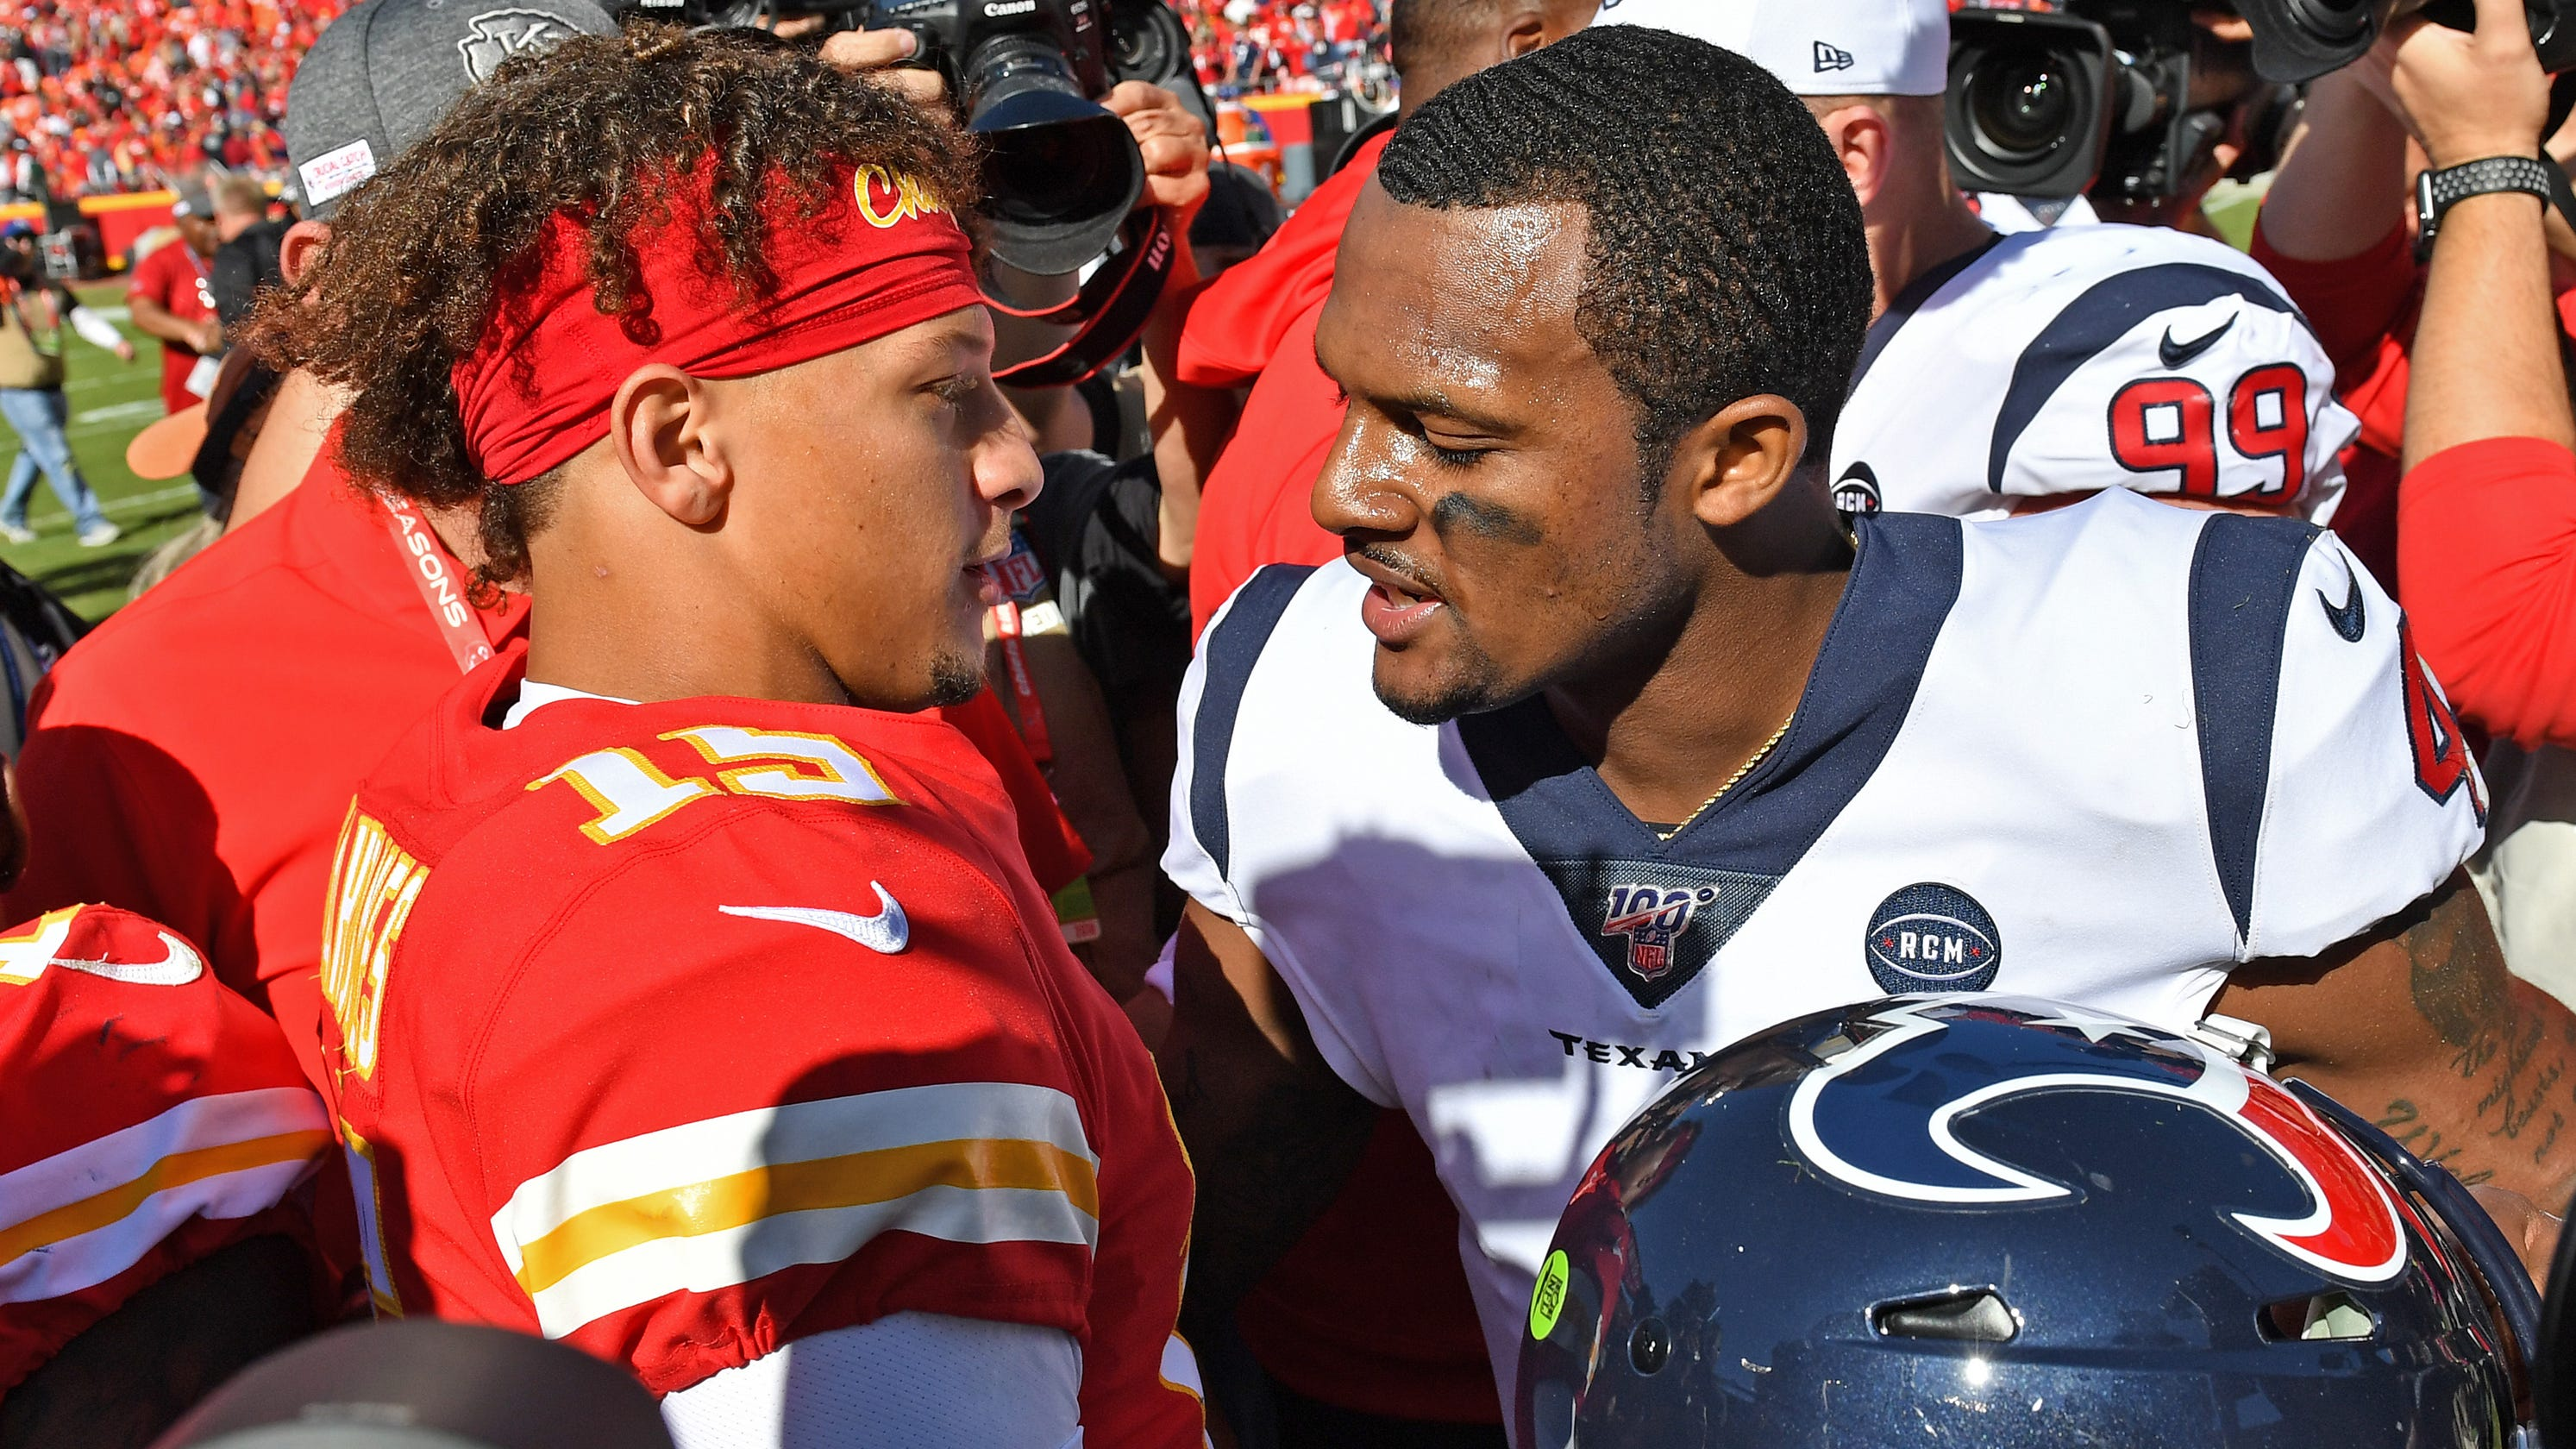 NFL stars Patrick Mahomes, Deshaun Watson are intertwined in many ways